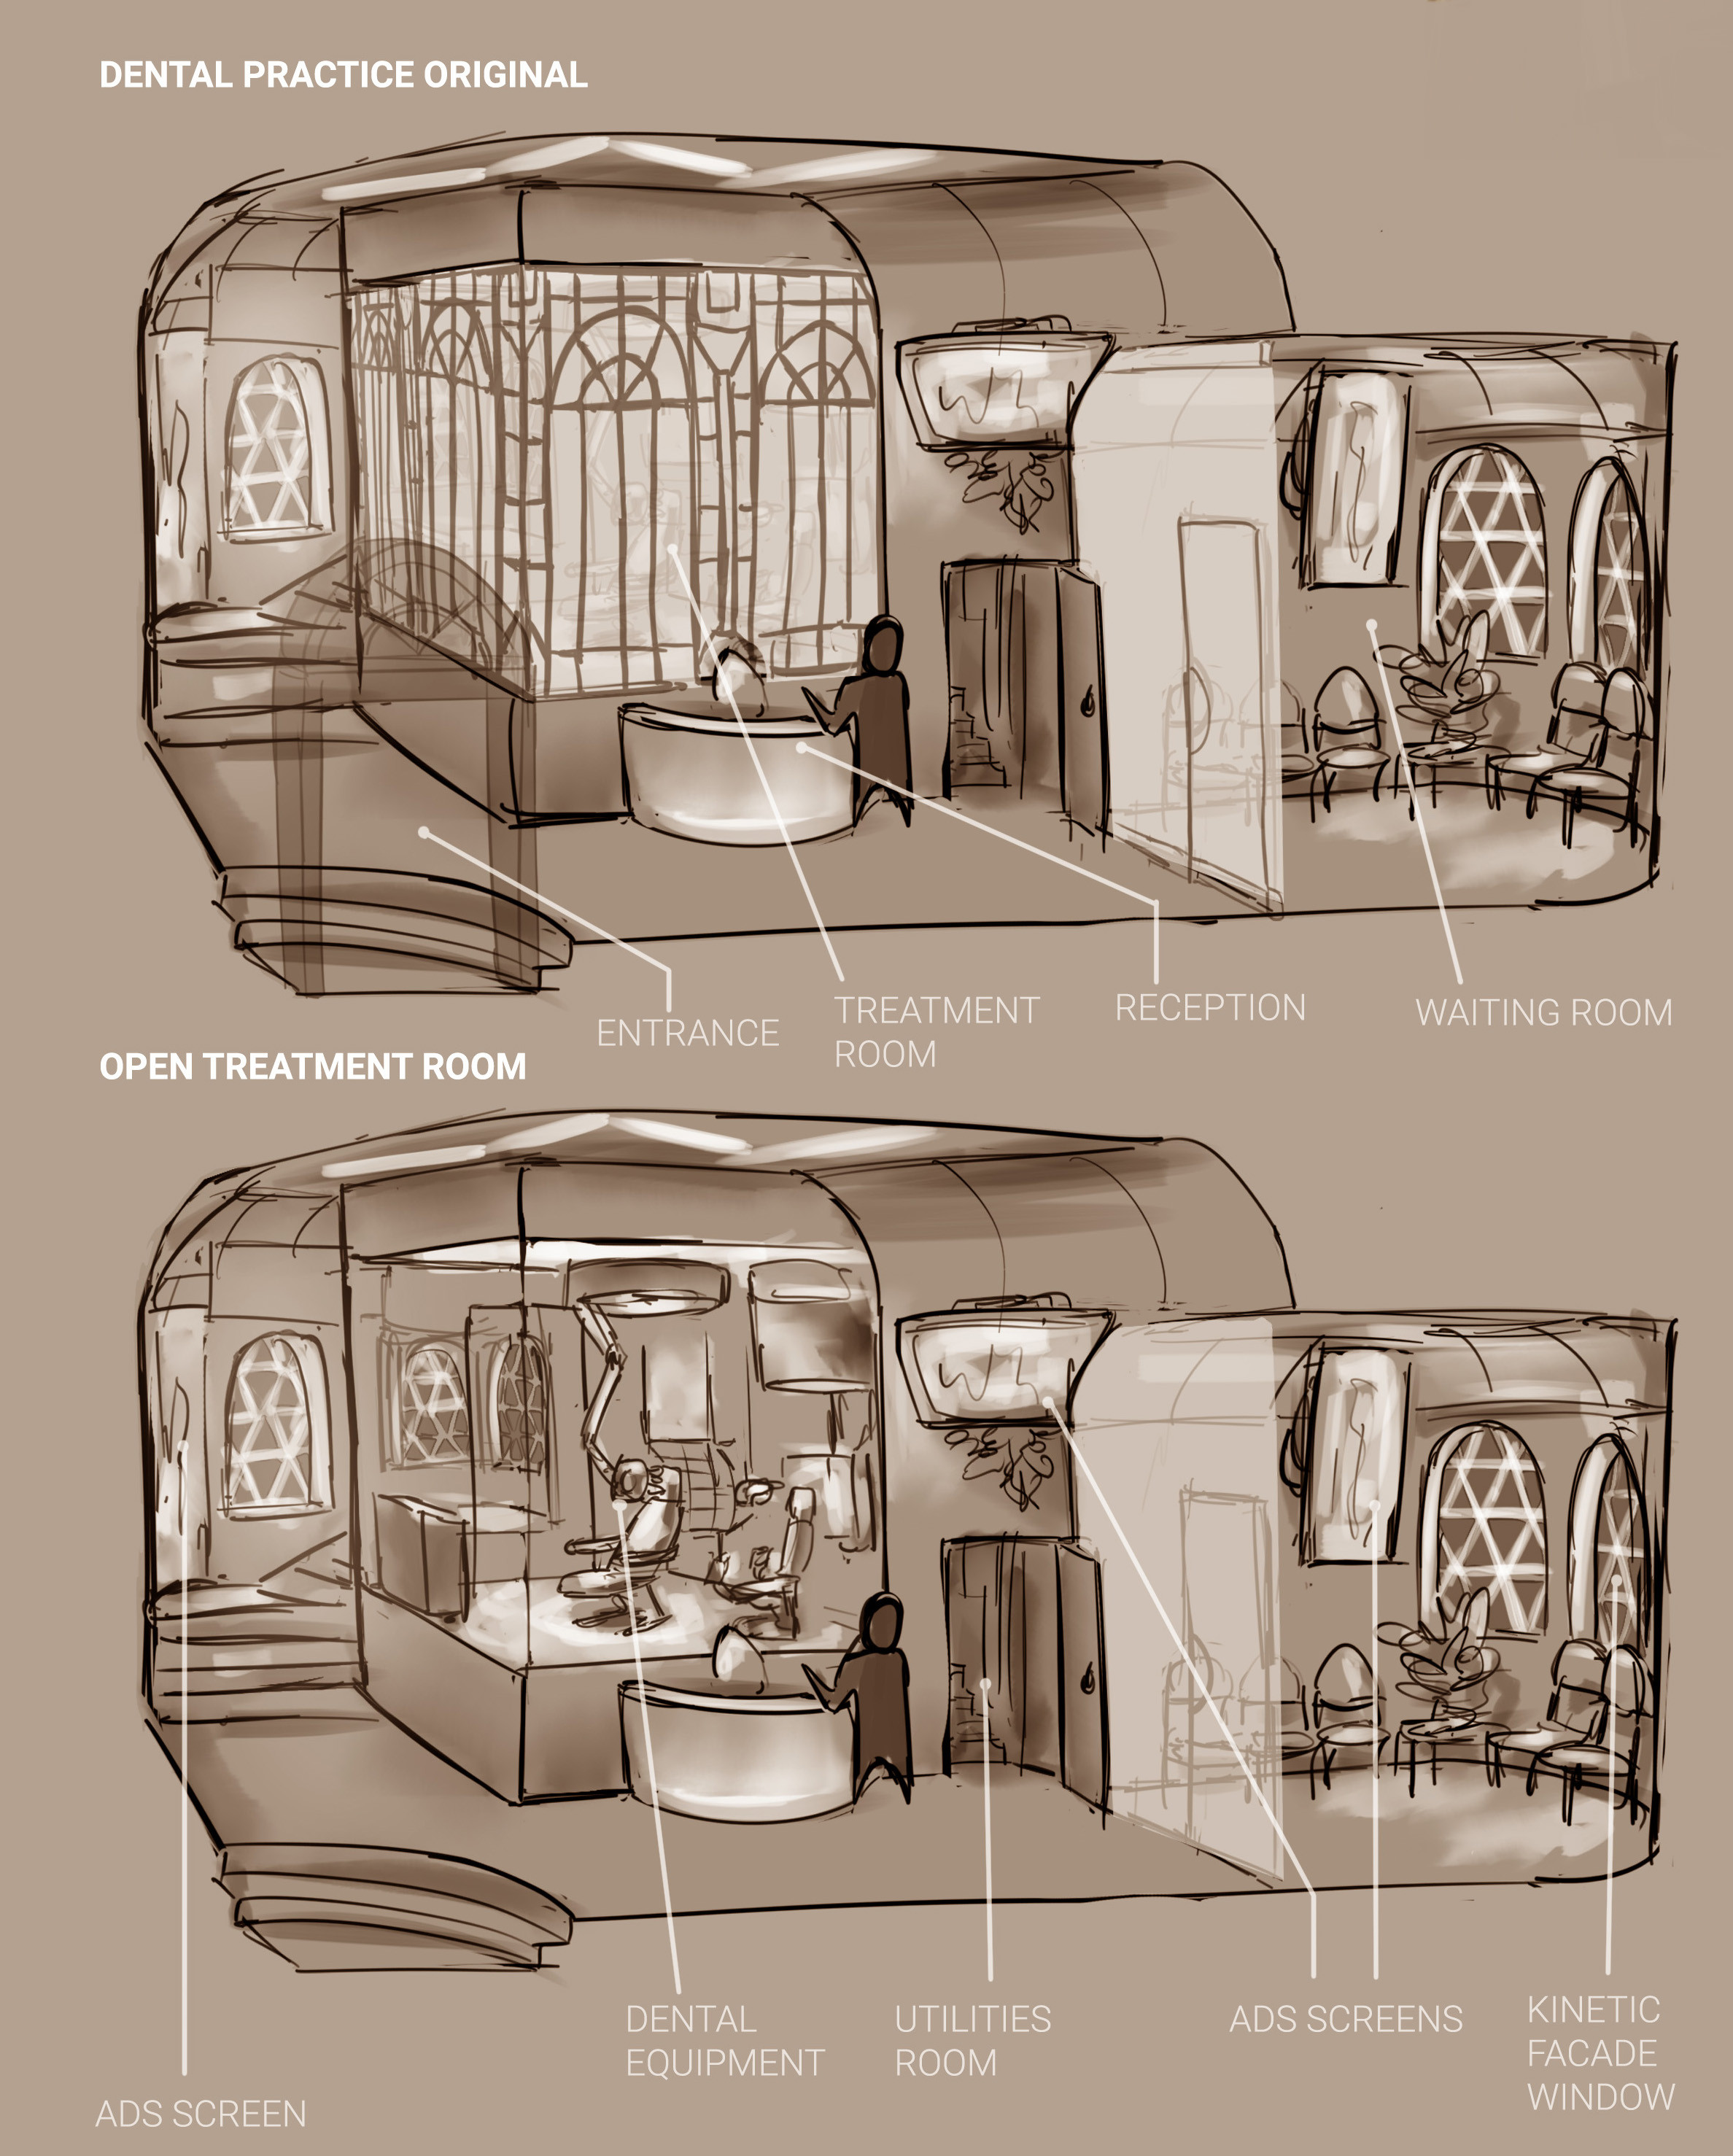 Sketches: Dental practice